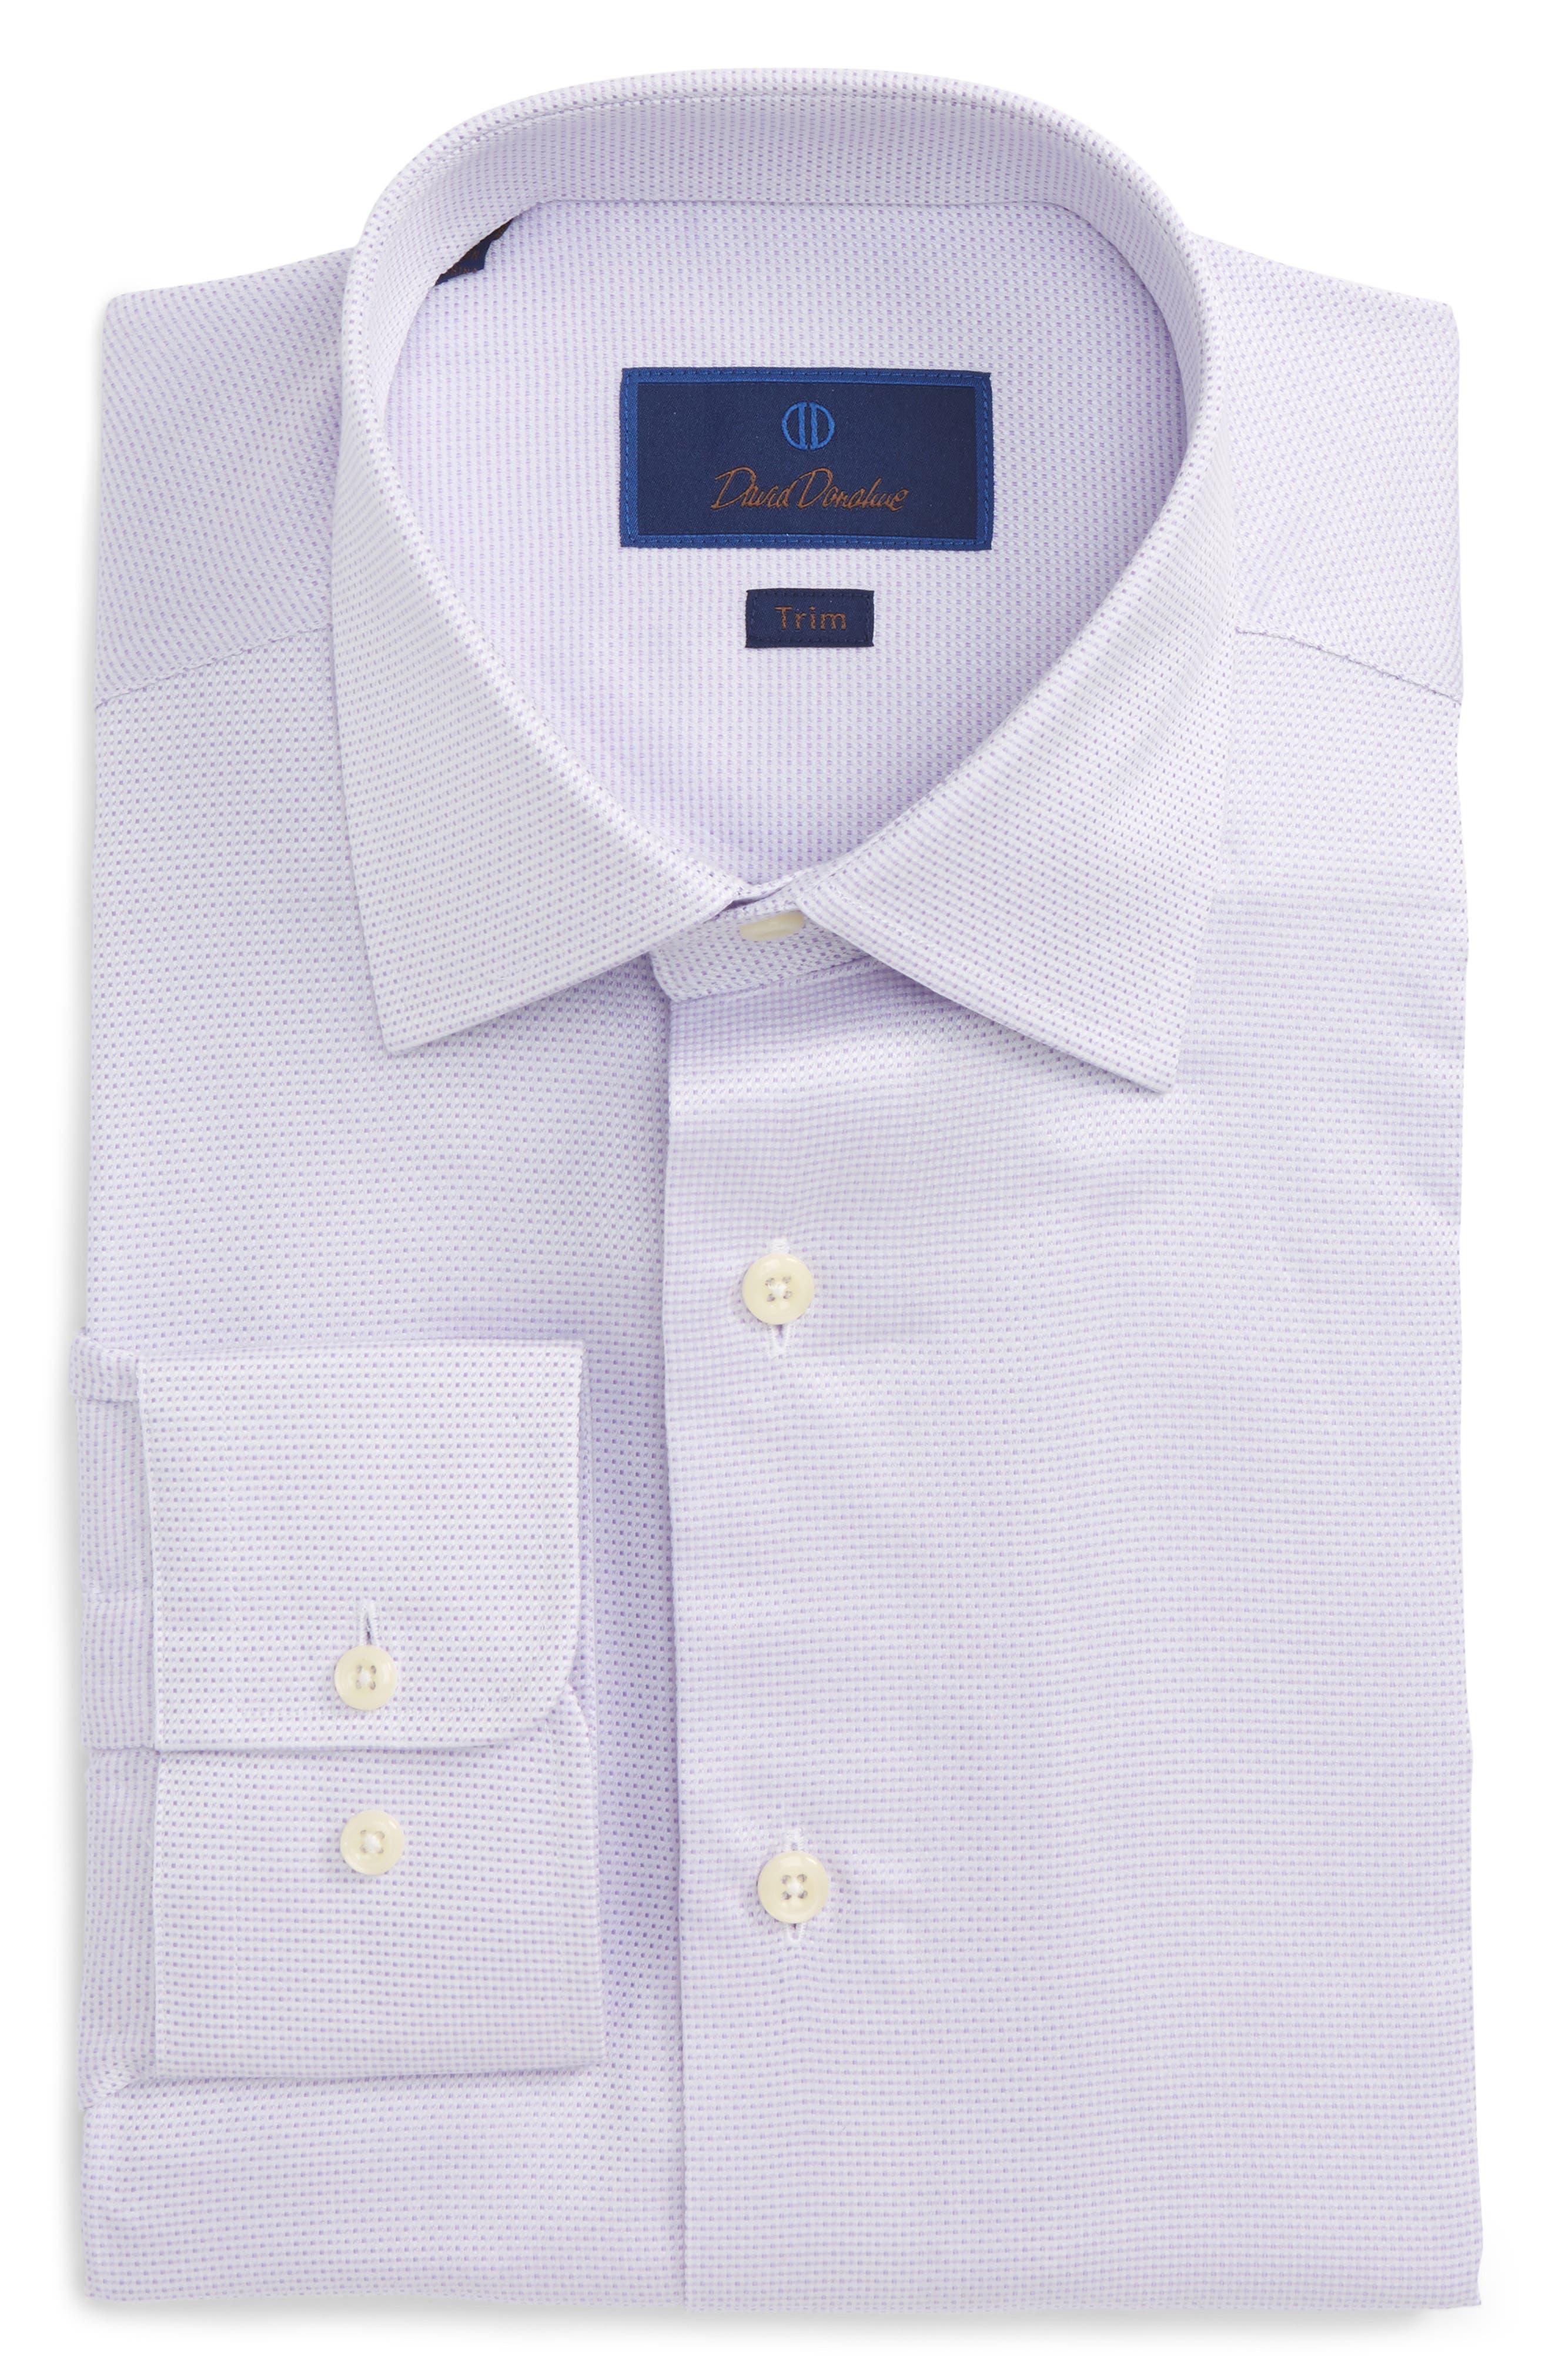 David Donahue Trim Fit Microdot Dress Shirt